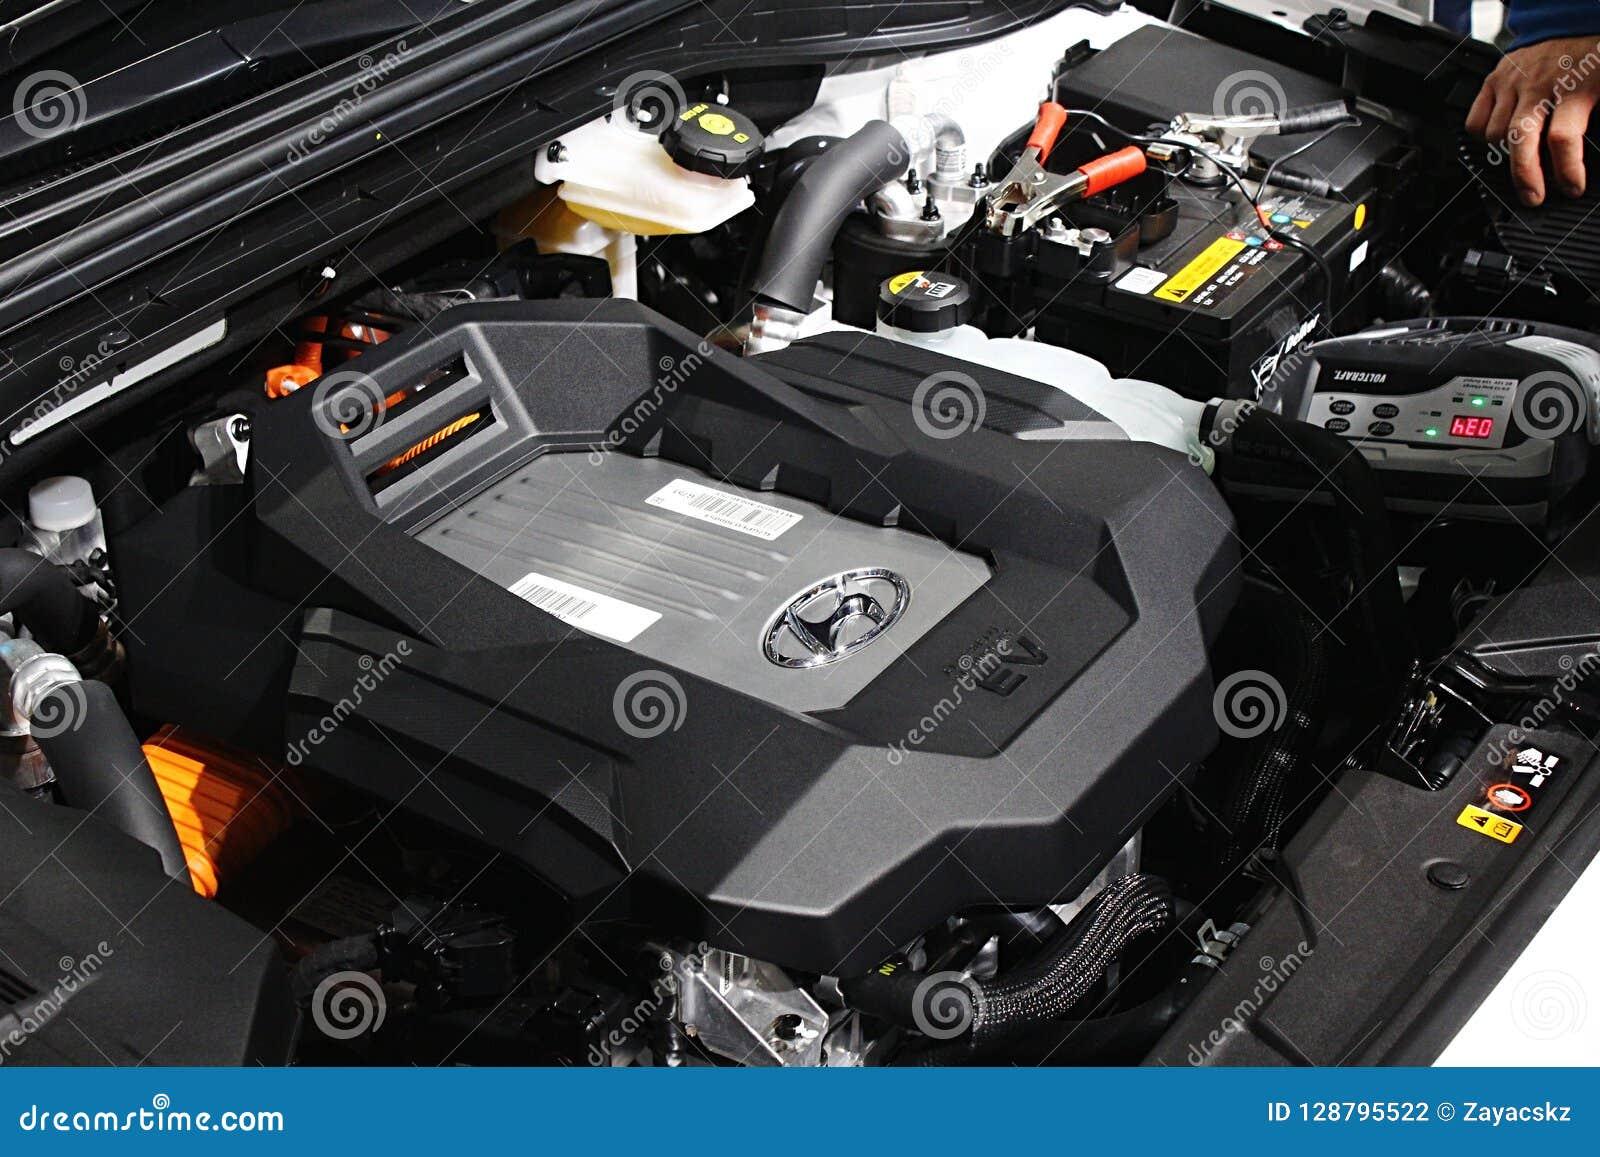 engine of modern hydrogen fuel cell powered suv car hyundai nexo